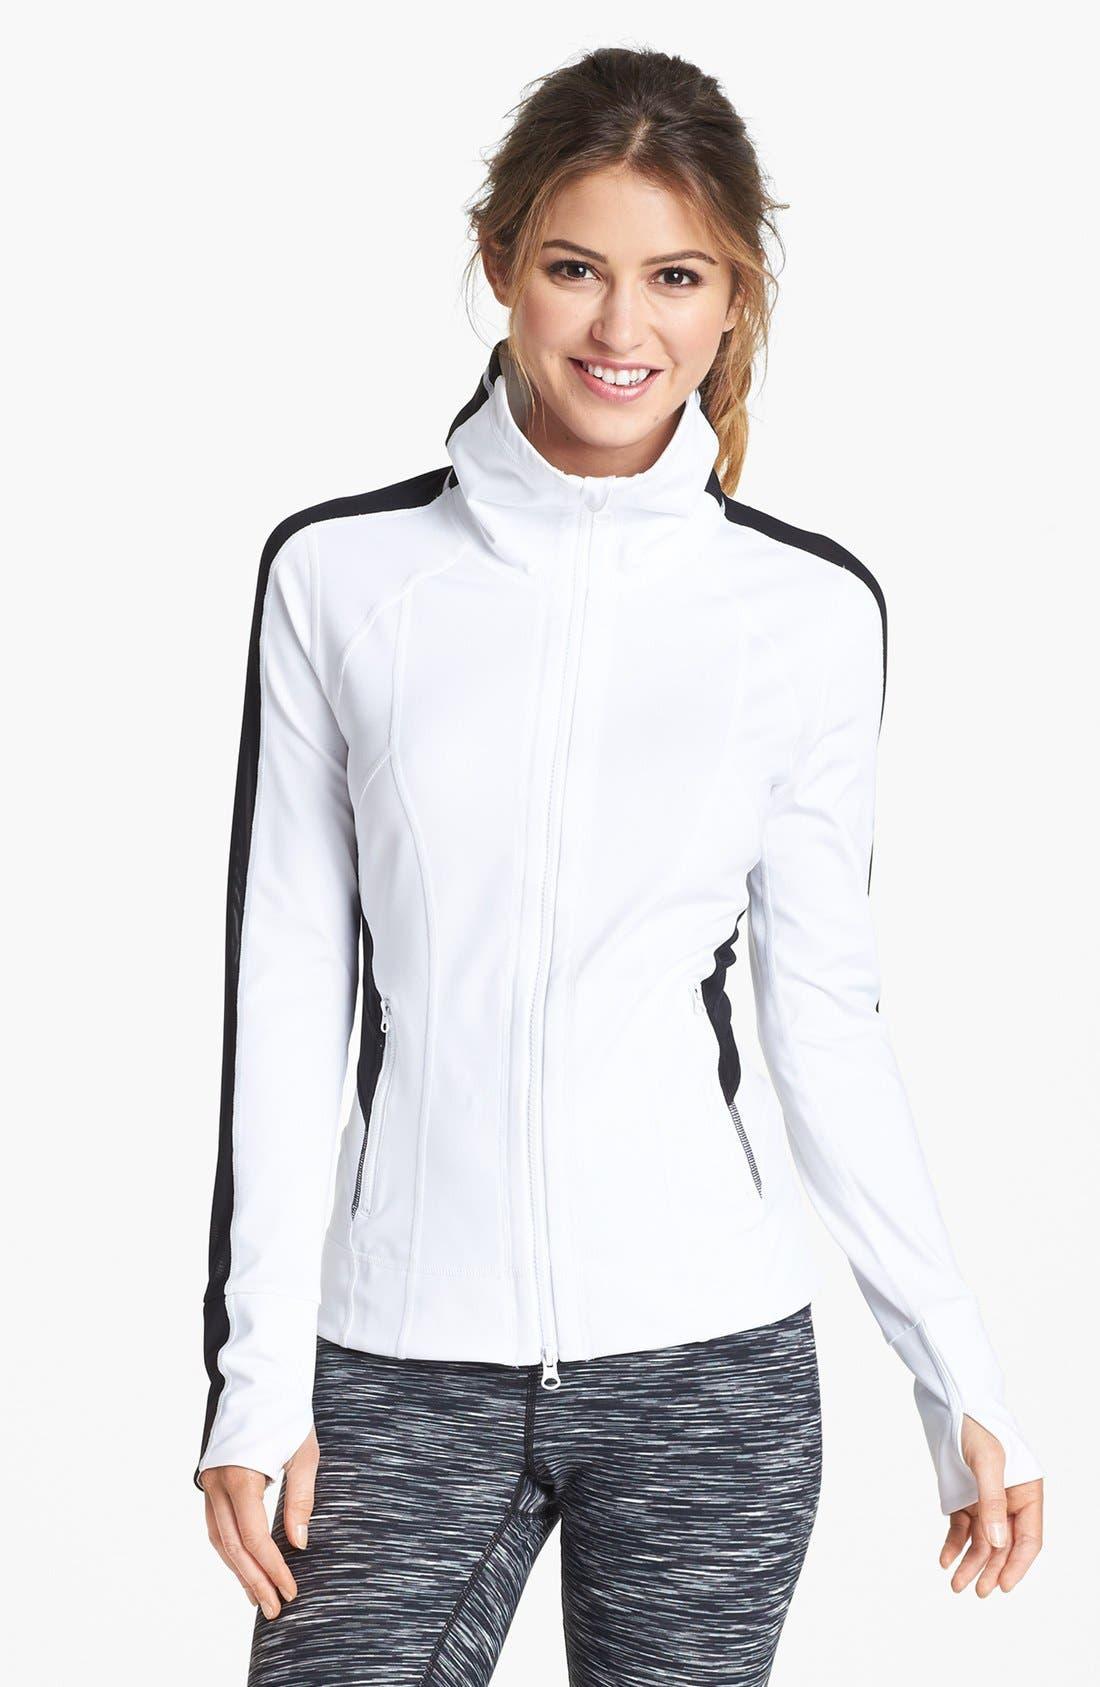 Alternate Image 1 Selected - Zella 'Bliss' Colorblock Jacket